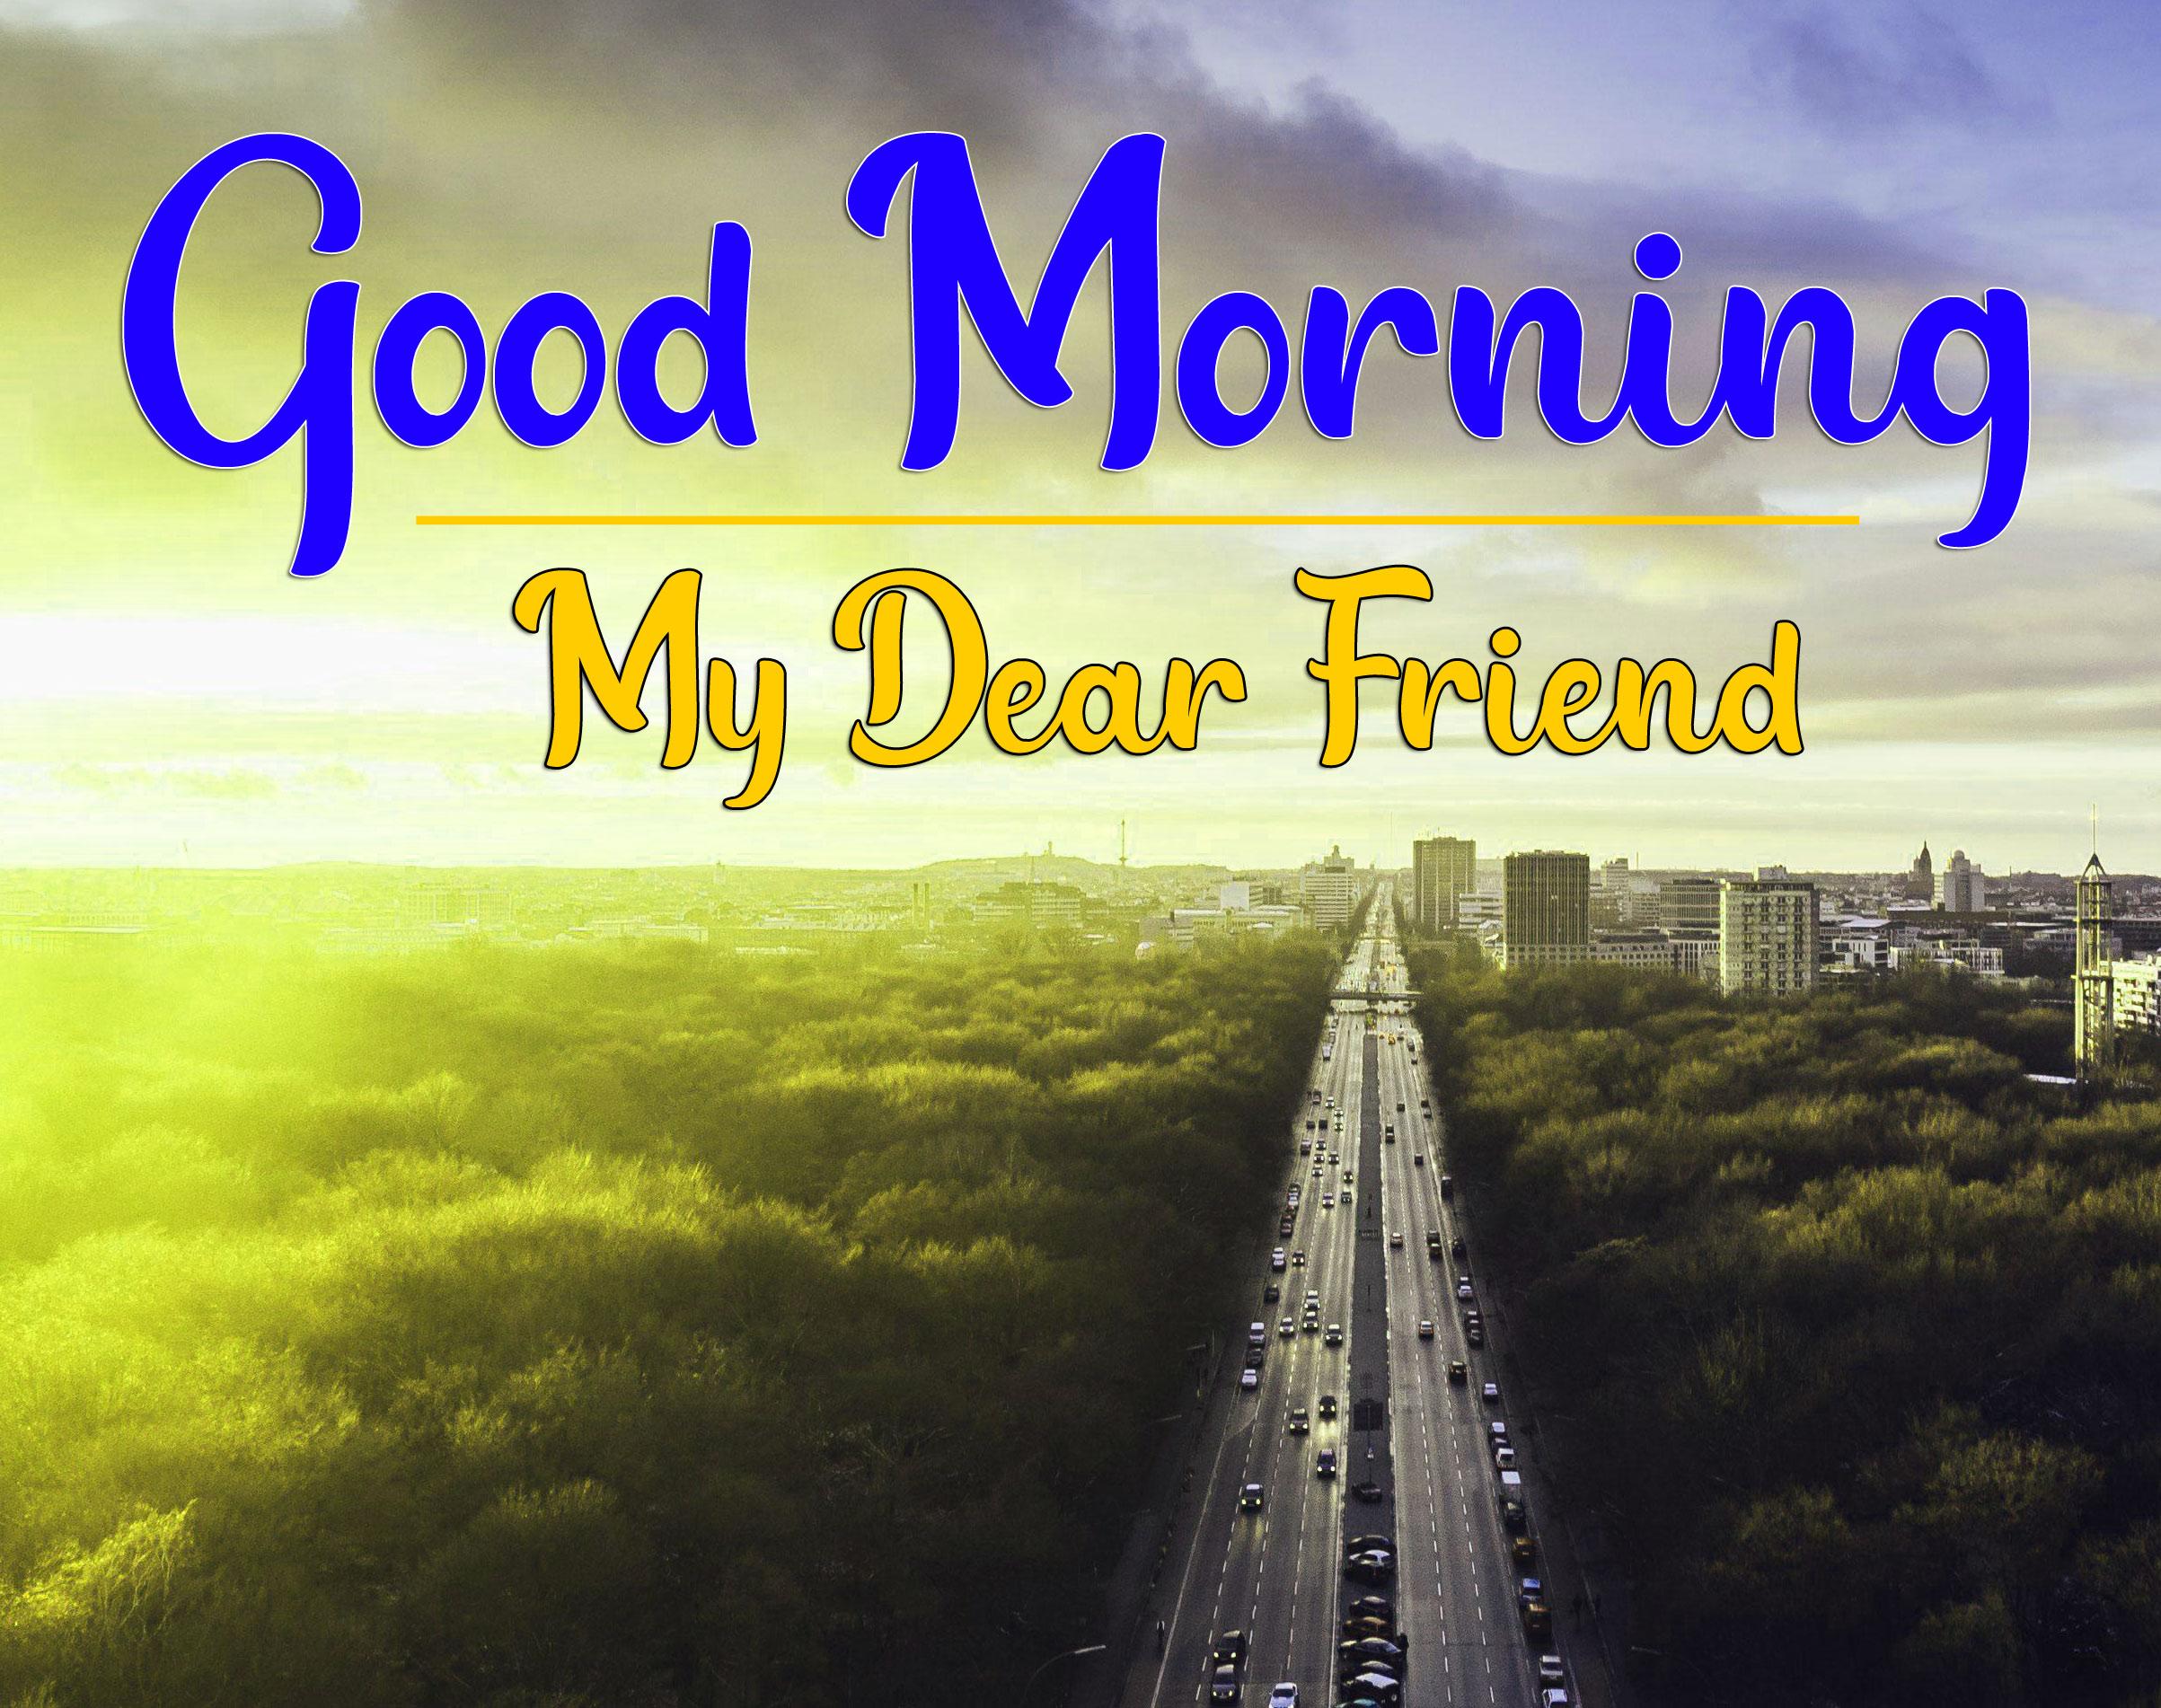 Nature Good Morning Wallpaper | Nature Good Morning | Nature Good Morning Pics